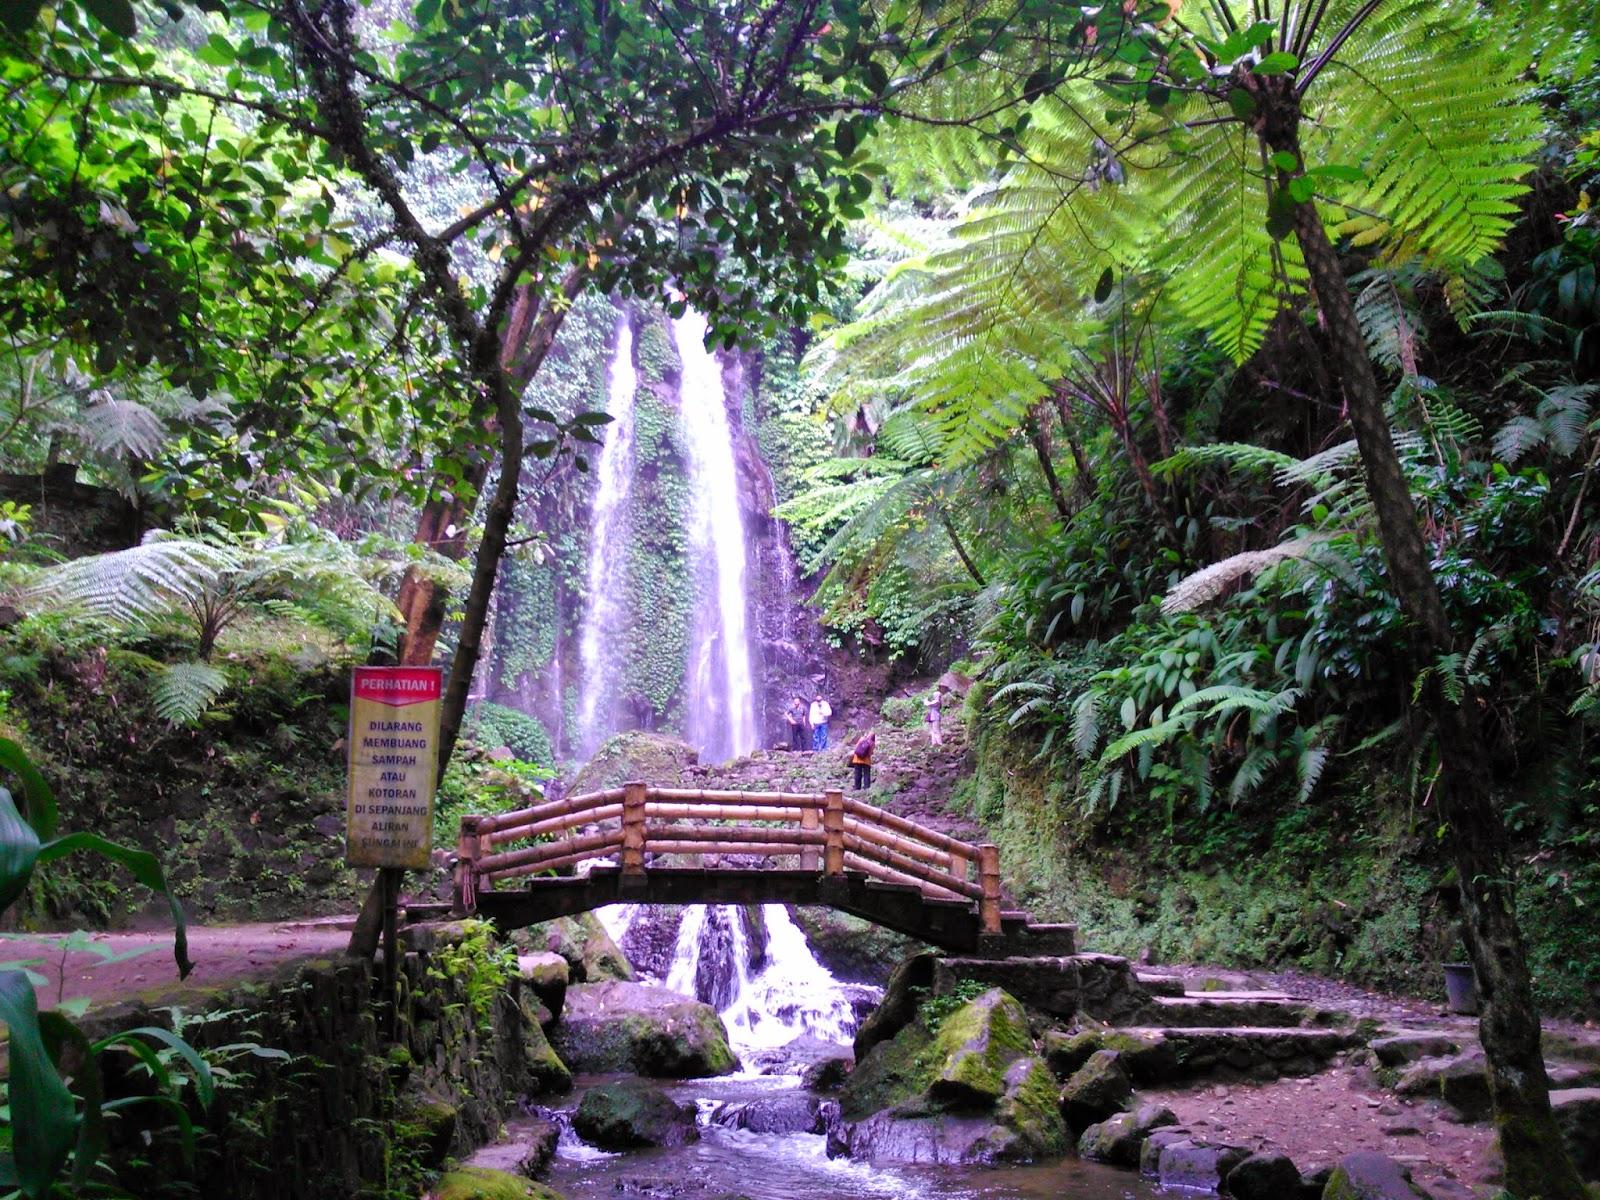 Tempat Wisata Karanganyar Popular Terindah 2018 Tahura Ngargoyoso Memiliki Tetangga